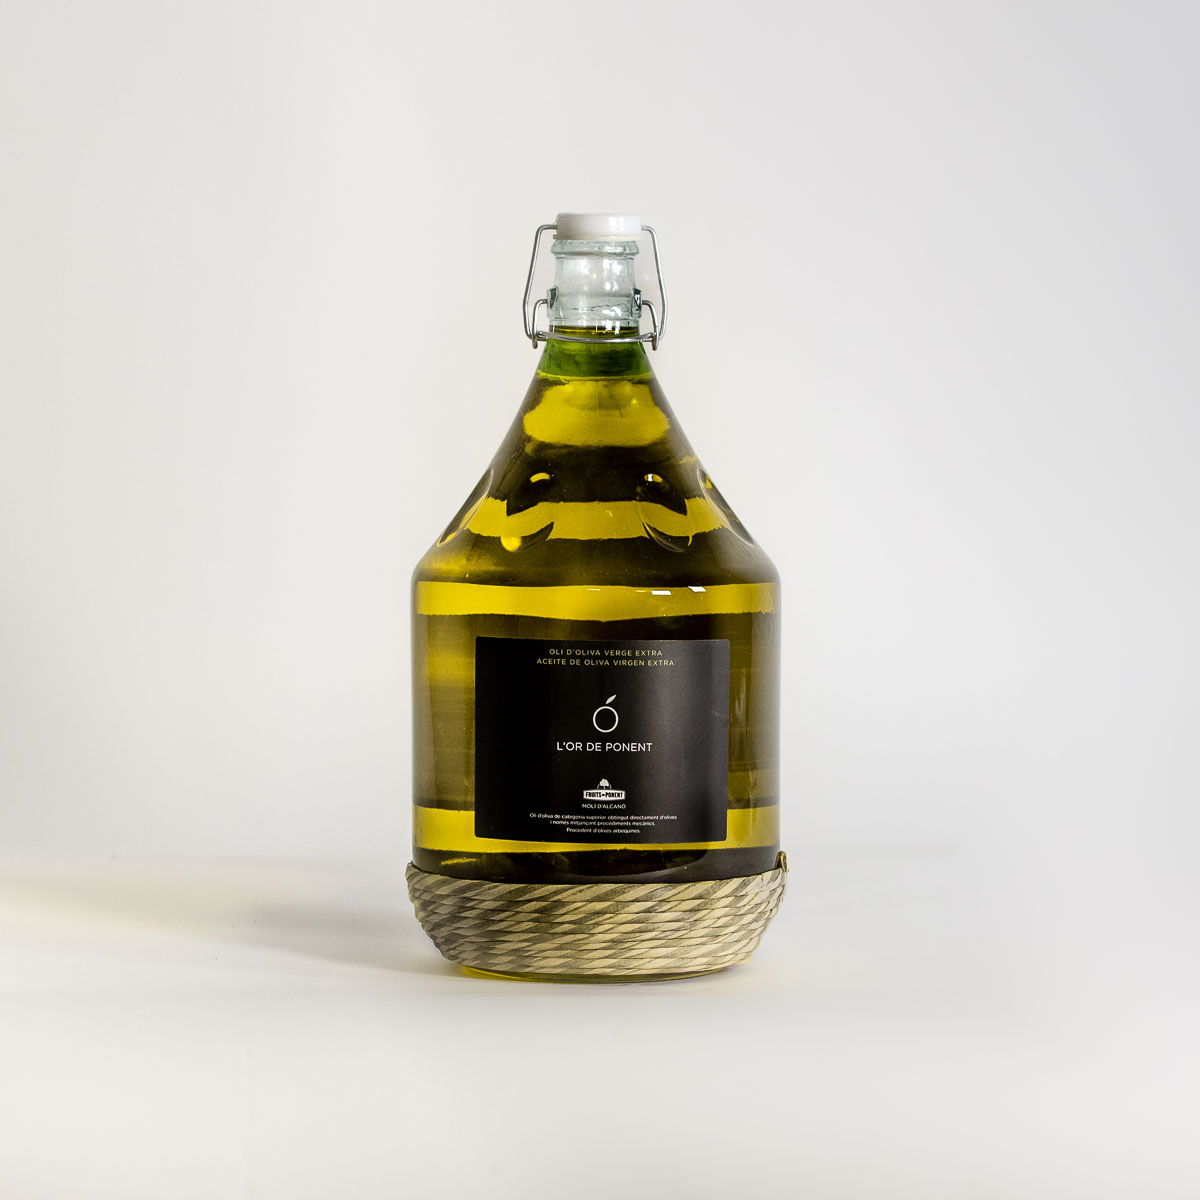 5 L- vidrio -Or-de-Ponent-aove-aceite-oliva-virgen-extra-garrigues-denominacion-origen-02-1